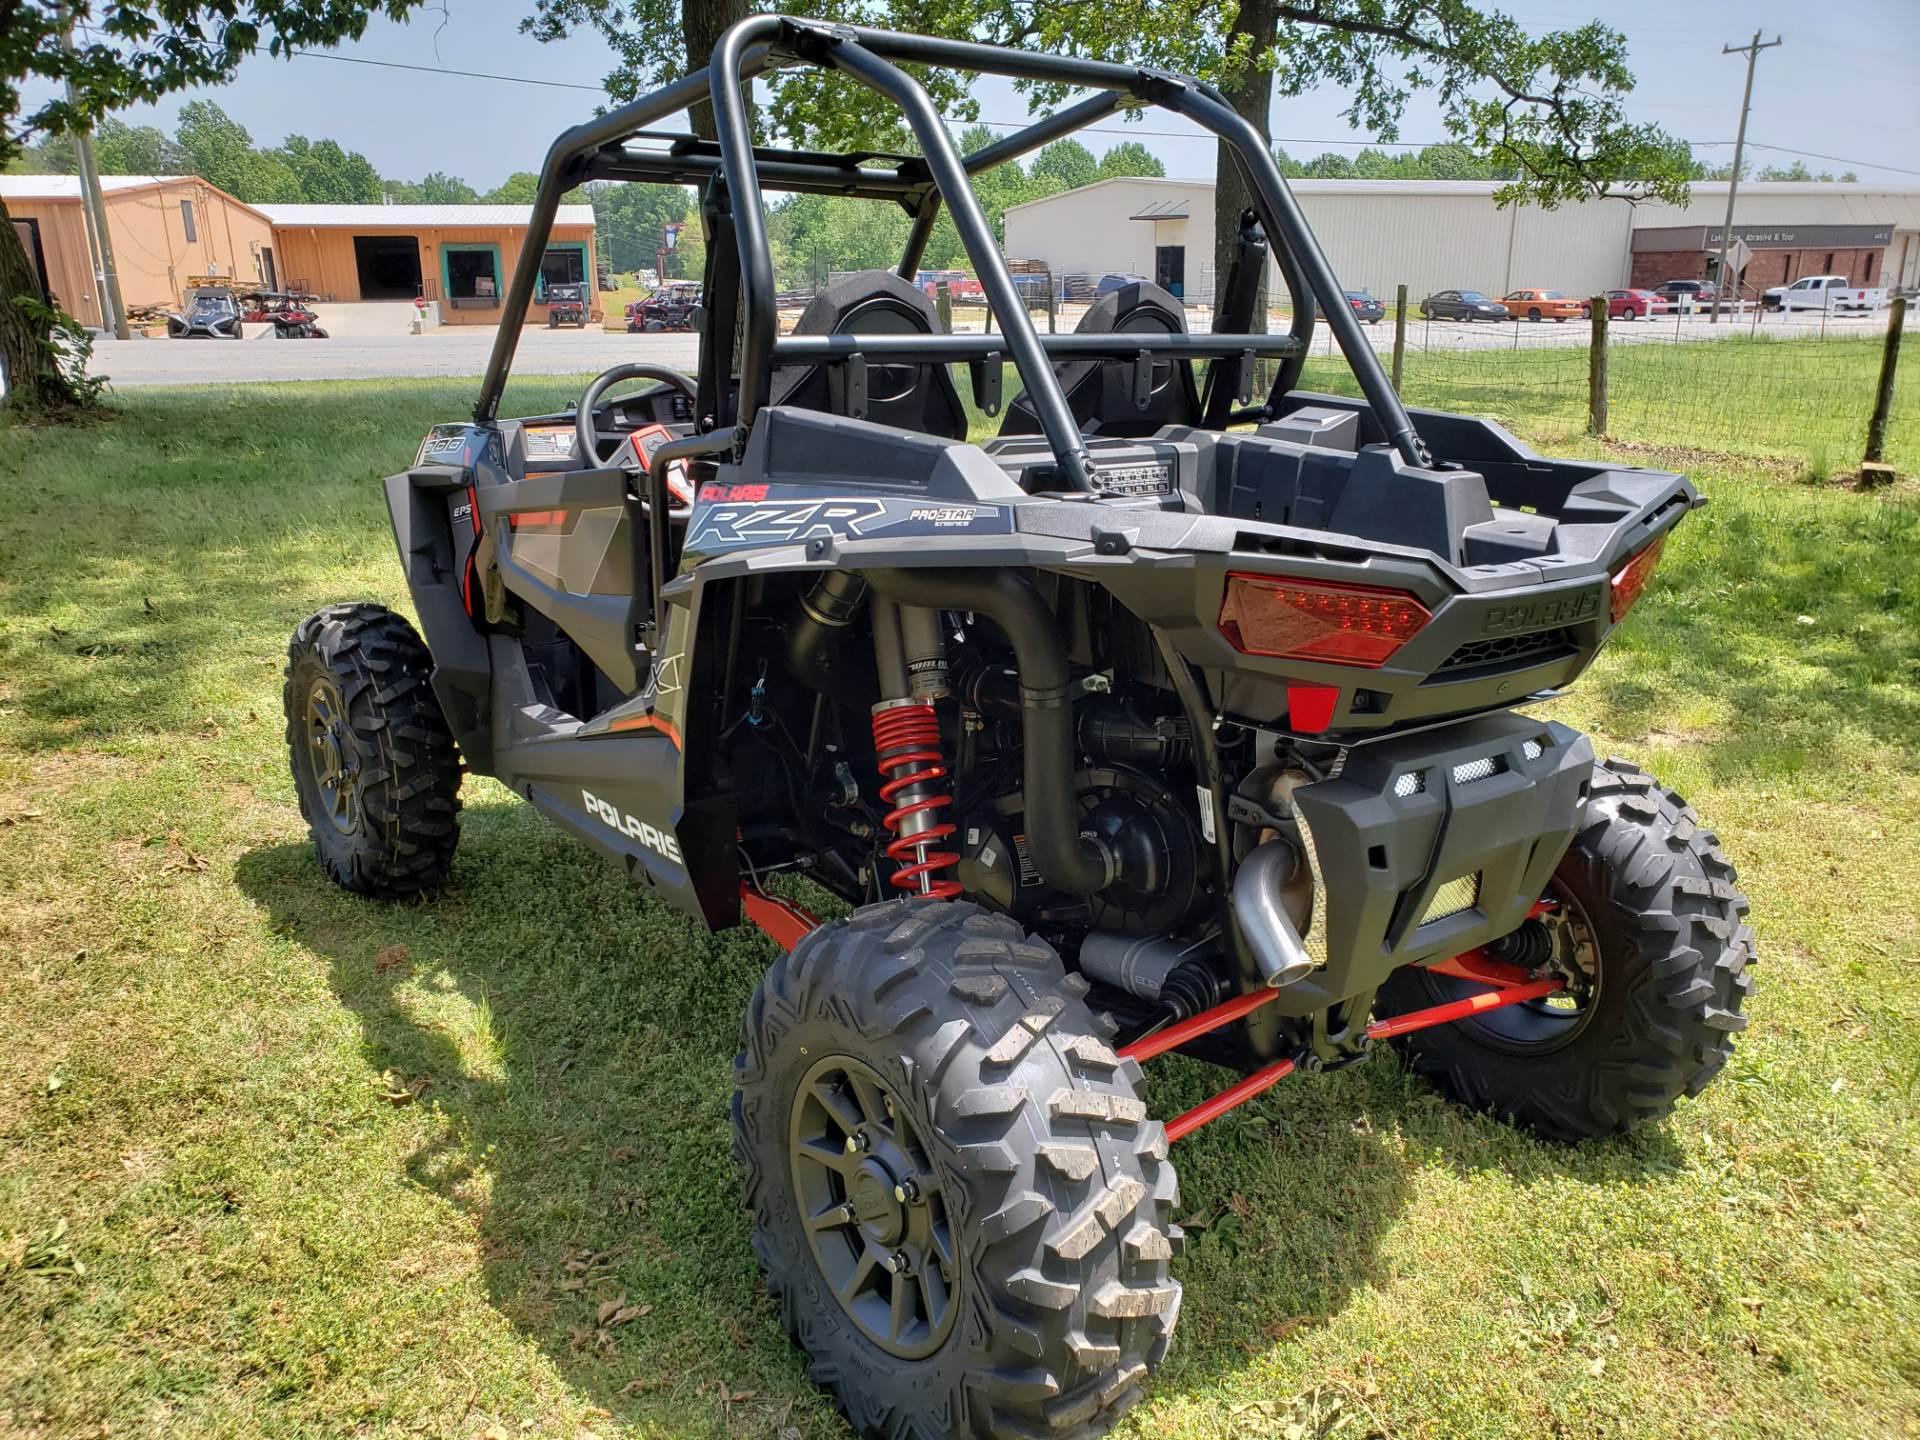 2018 Polaris RZR XP 1000 EPS Ride Command Edition 10